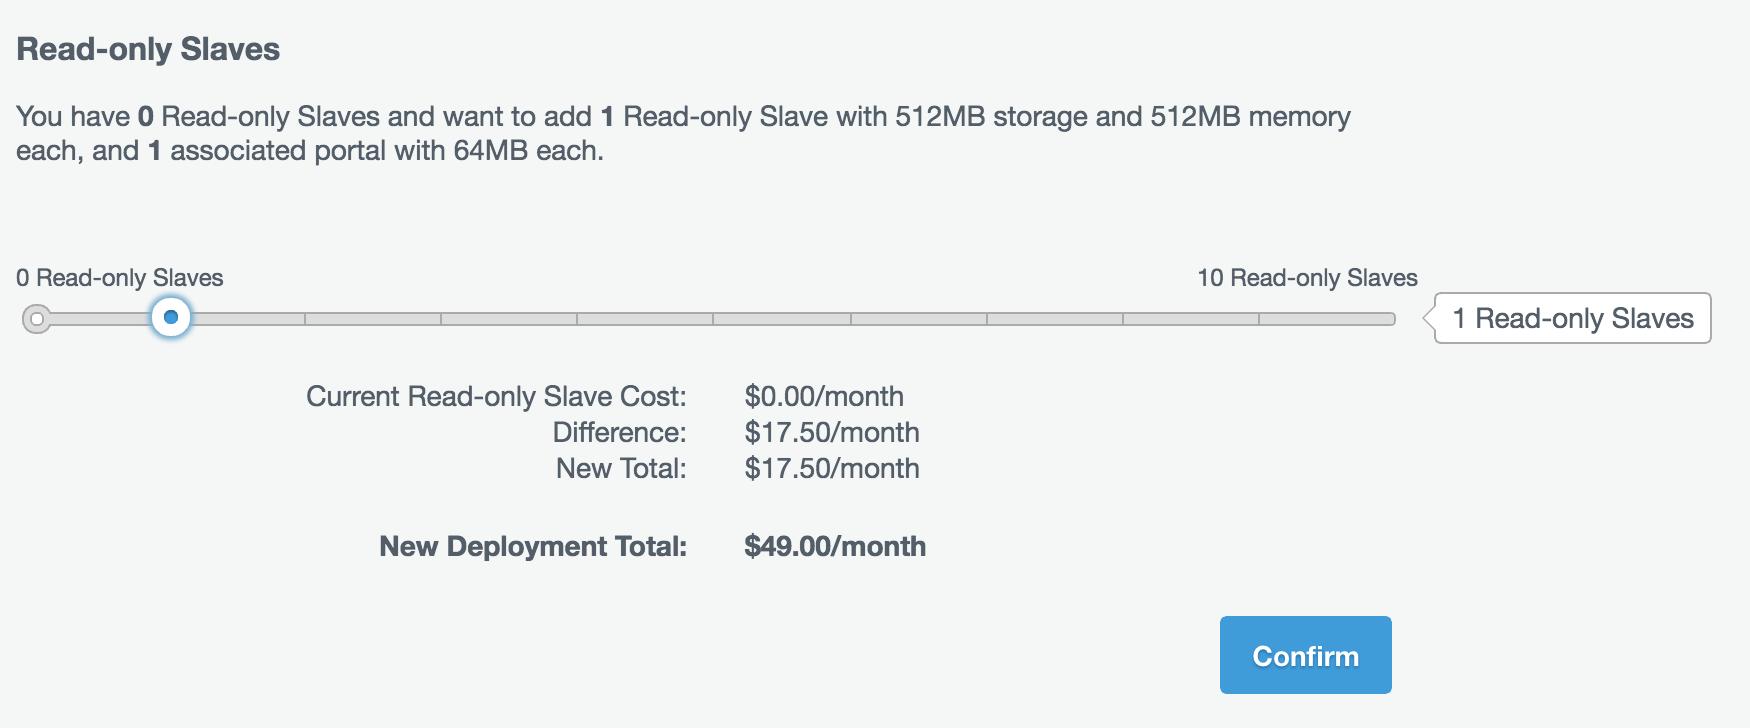 Adding a Read-only slave dialogue.